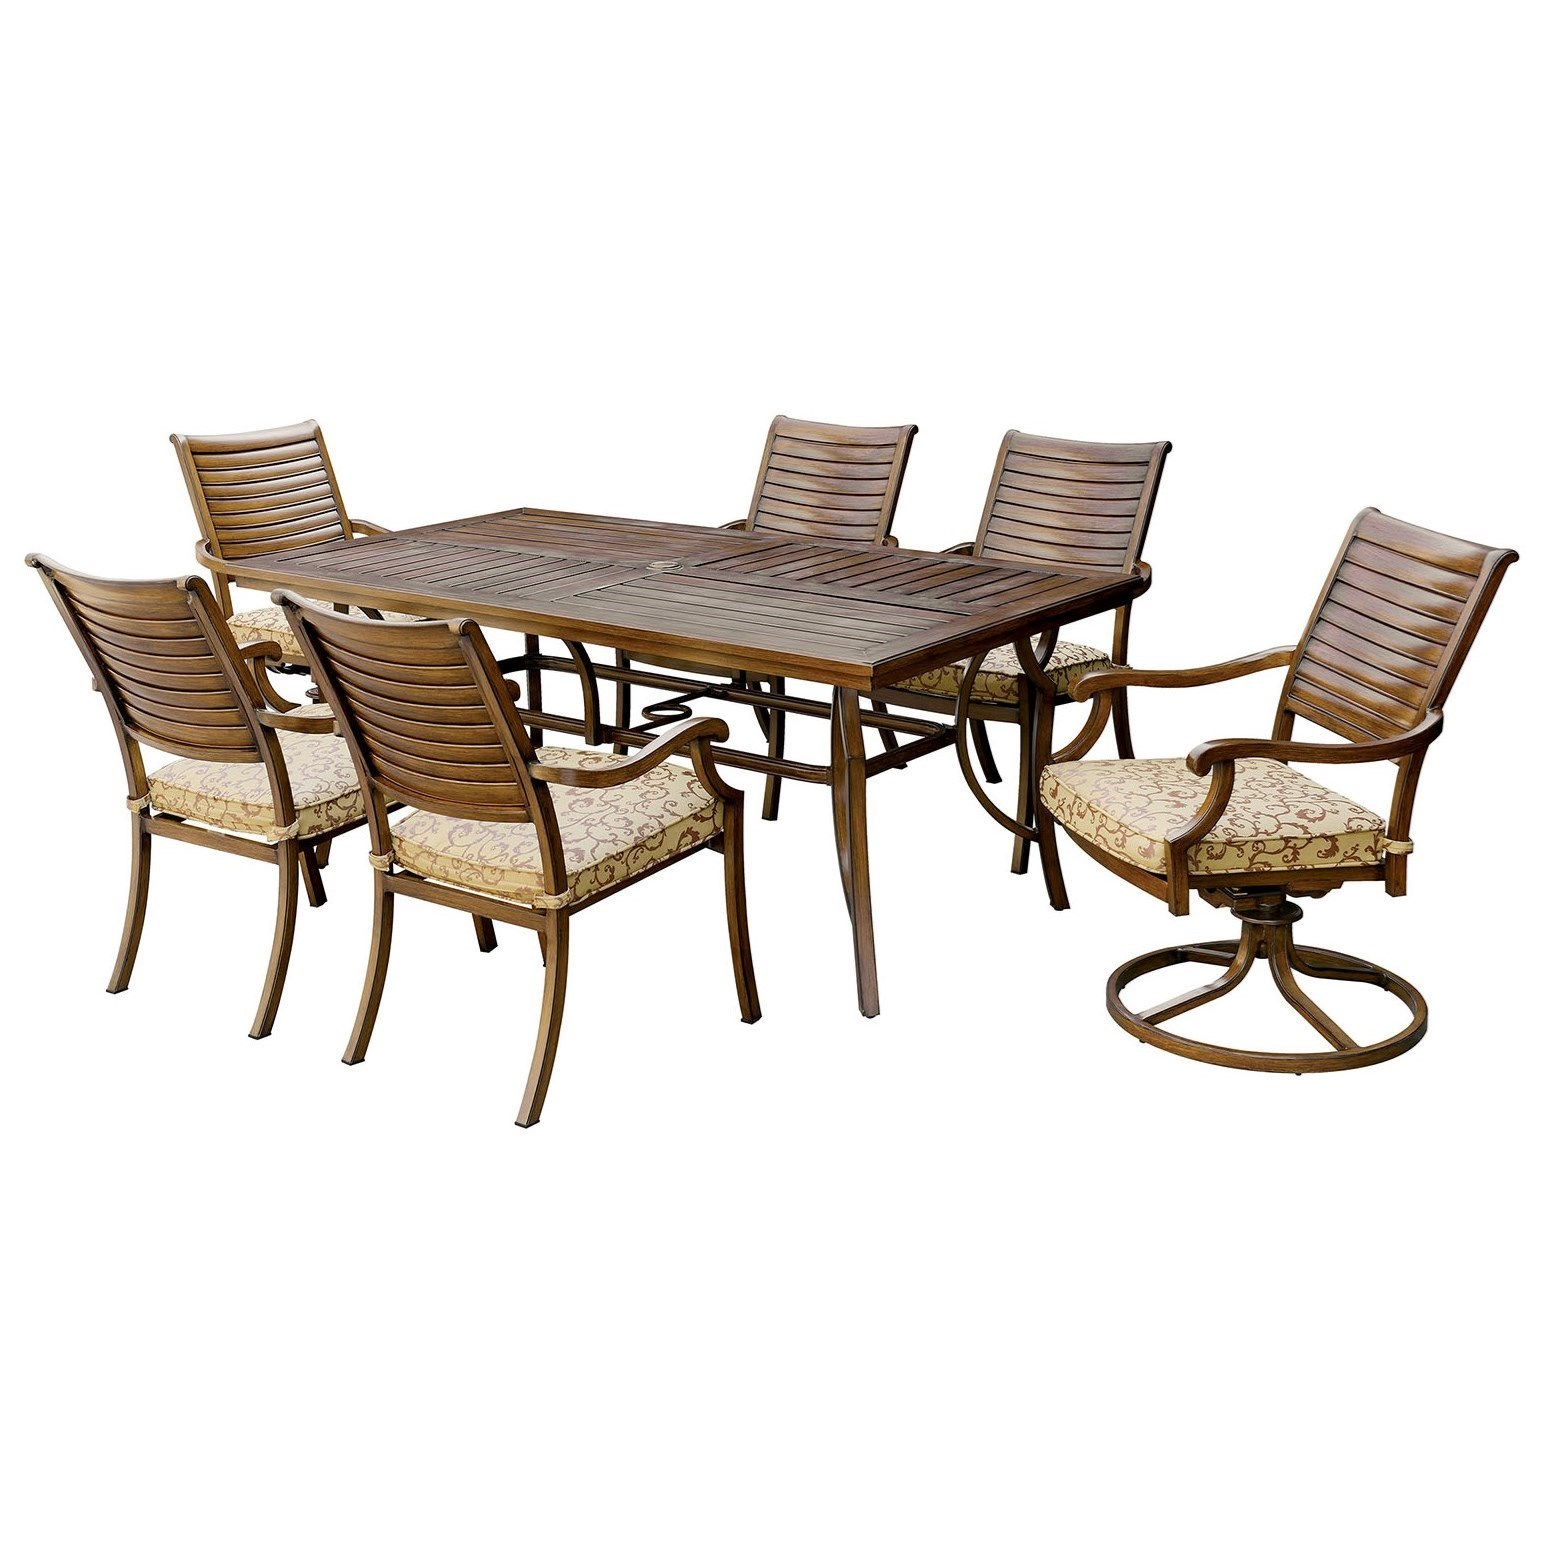 desiree furniture. Furniture Of America DesireePatio Dining Table Desiree N